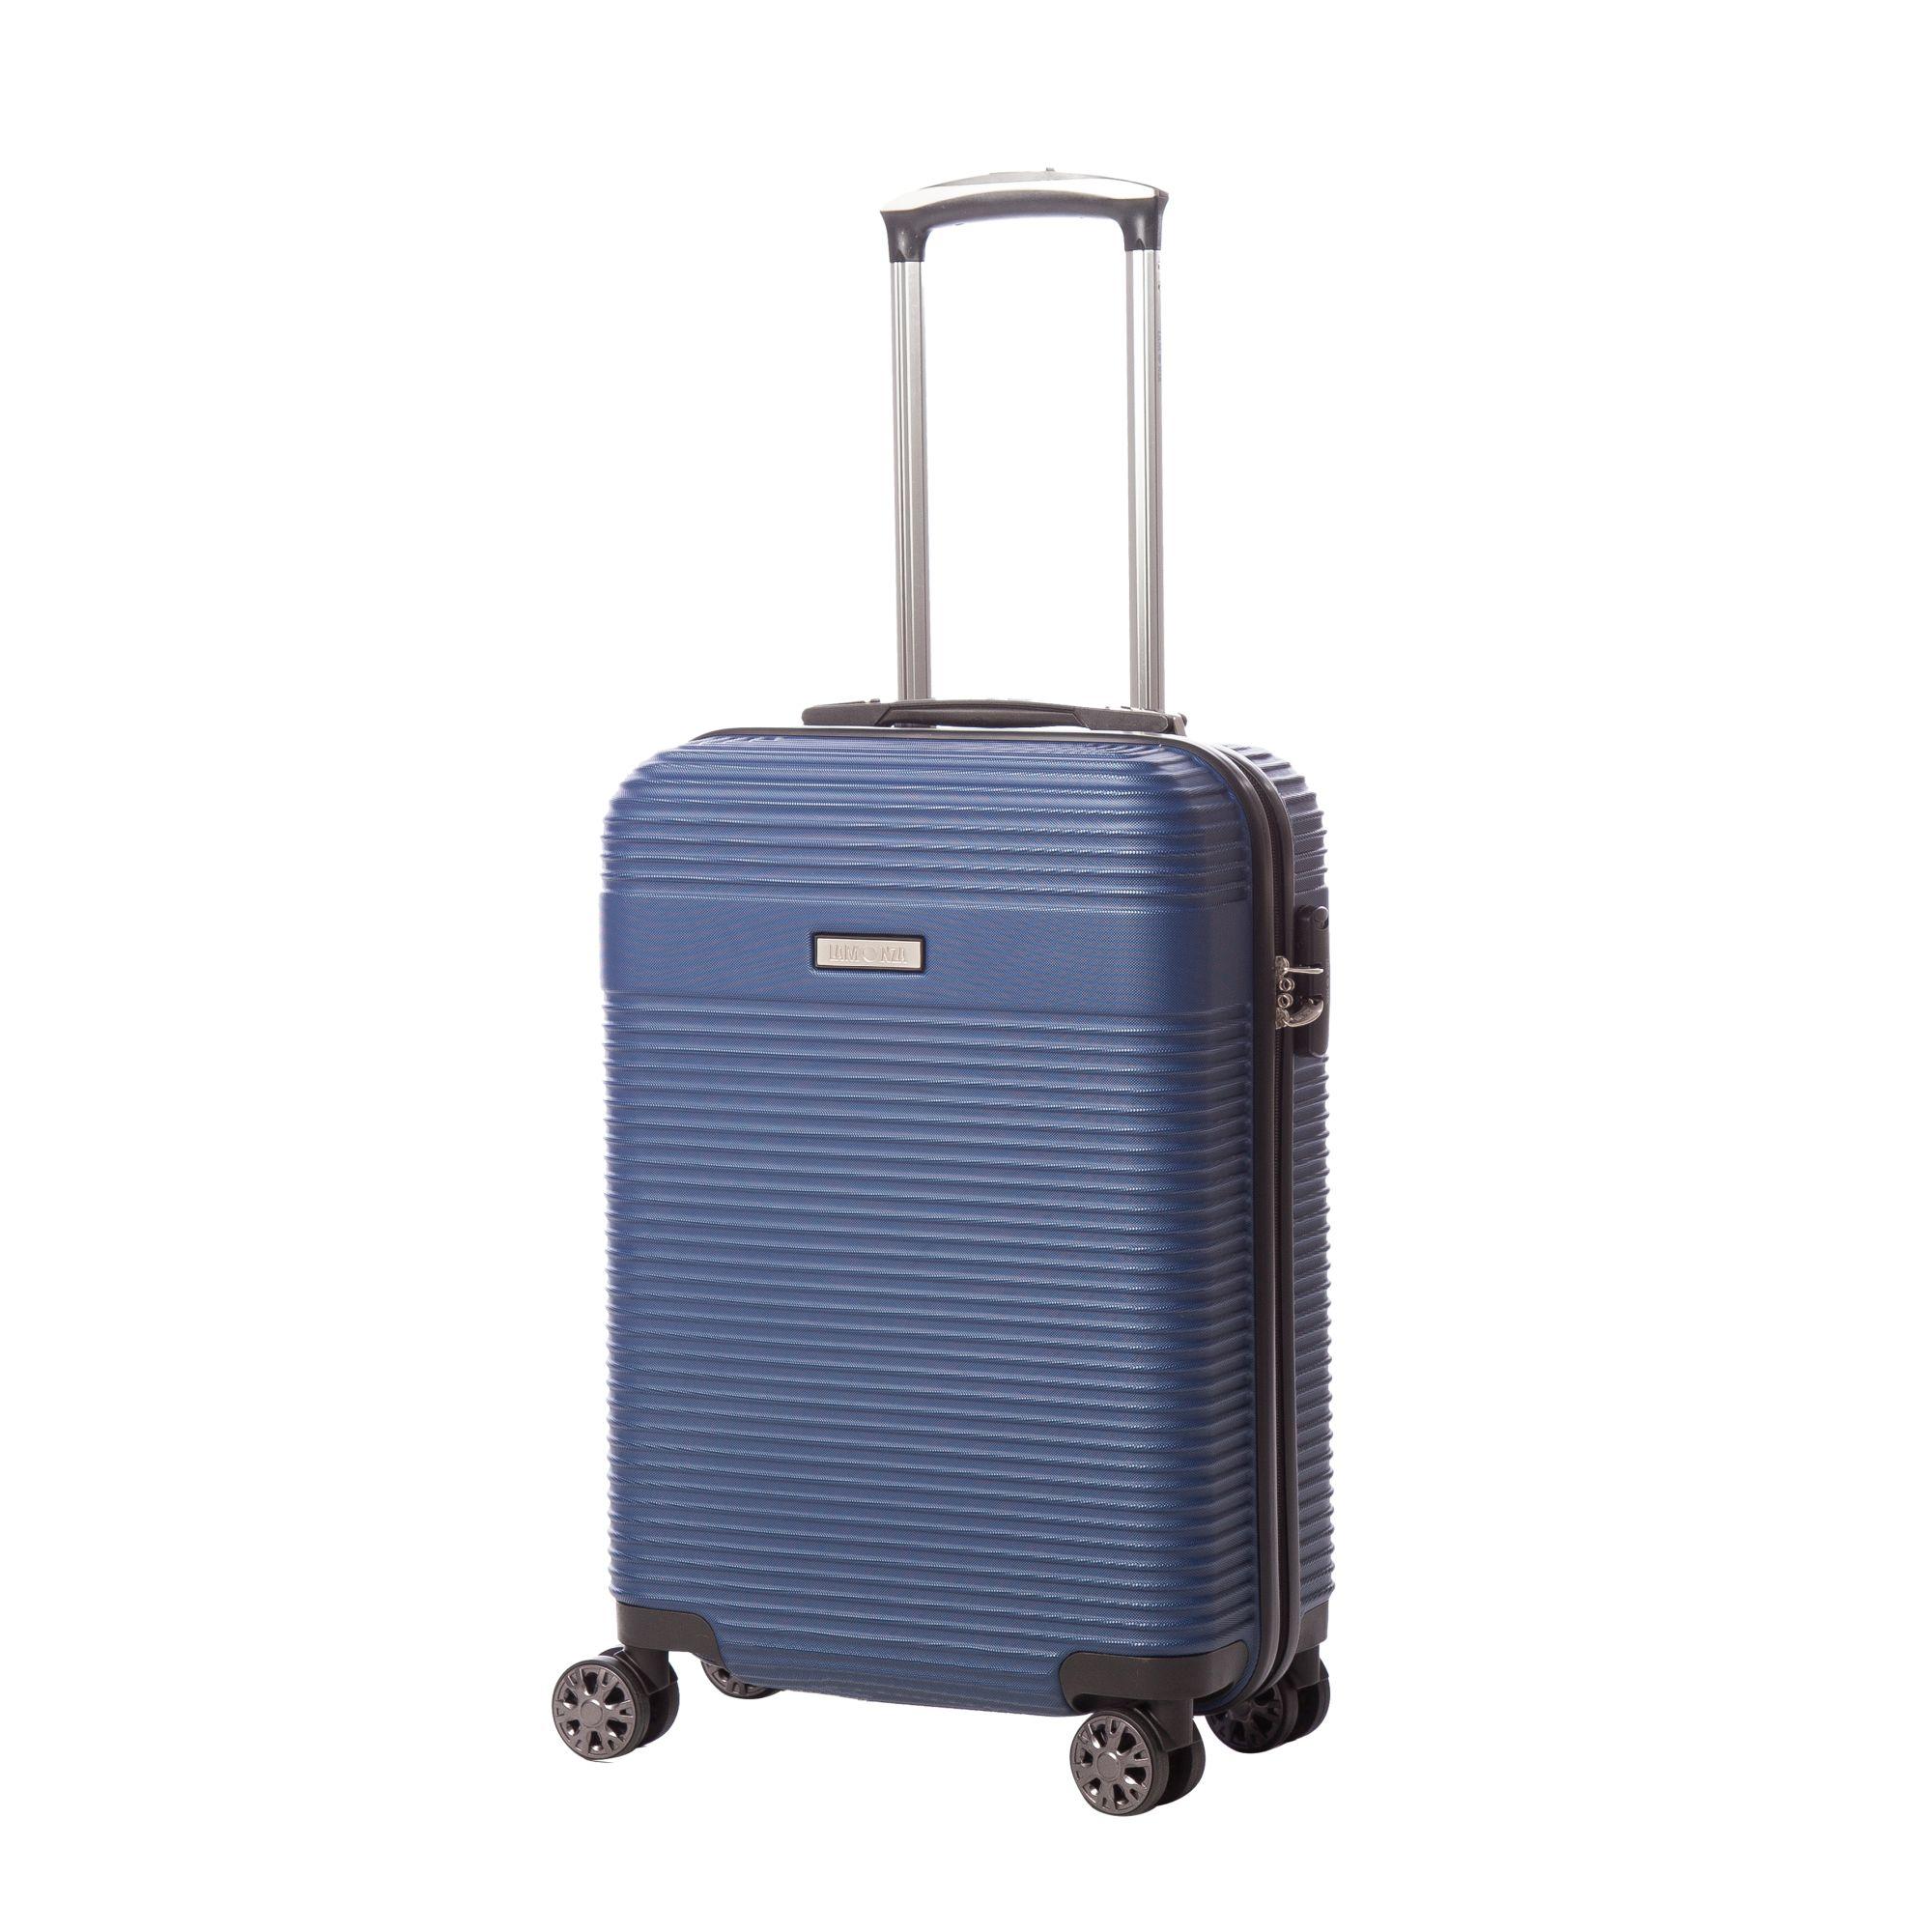 Troler Uptown 55x36x22 cm, 2.45 kg, albastru